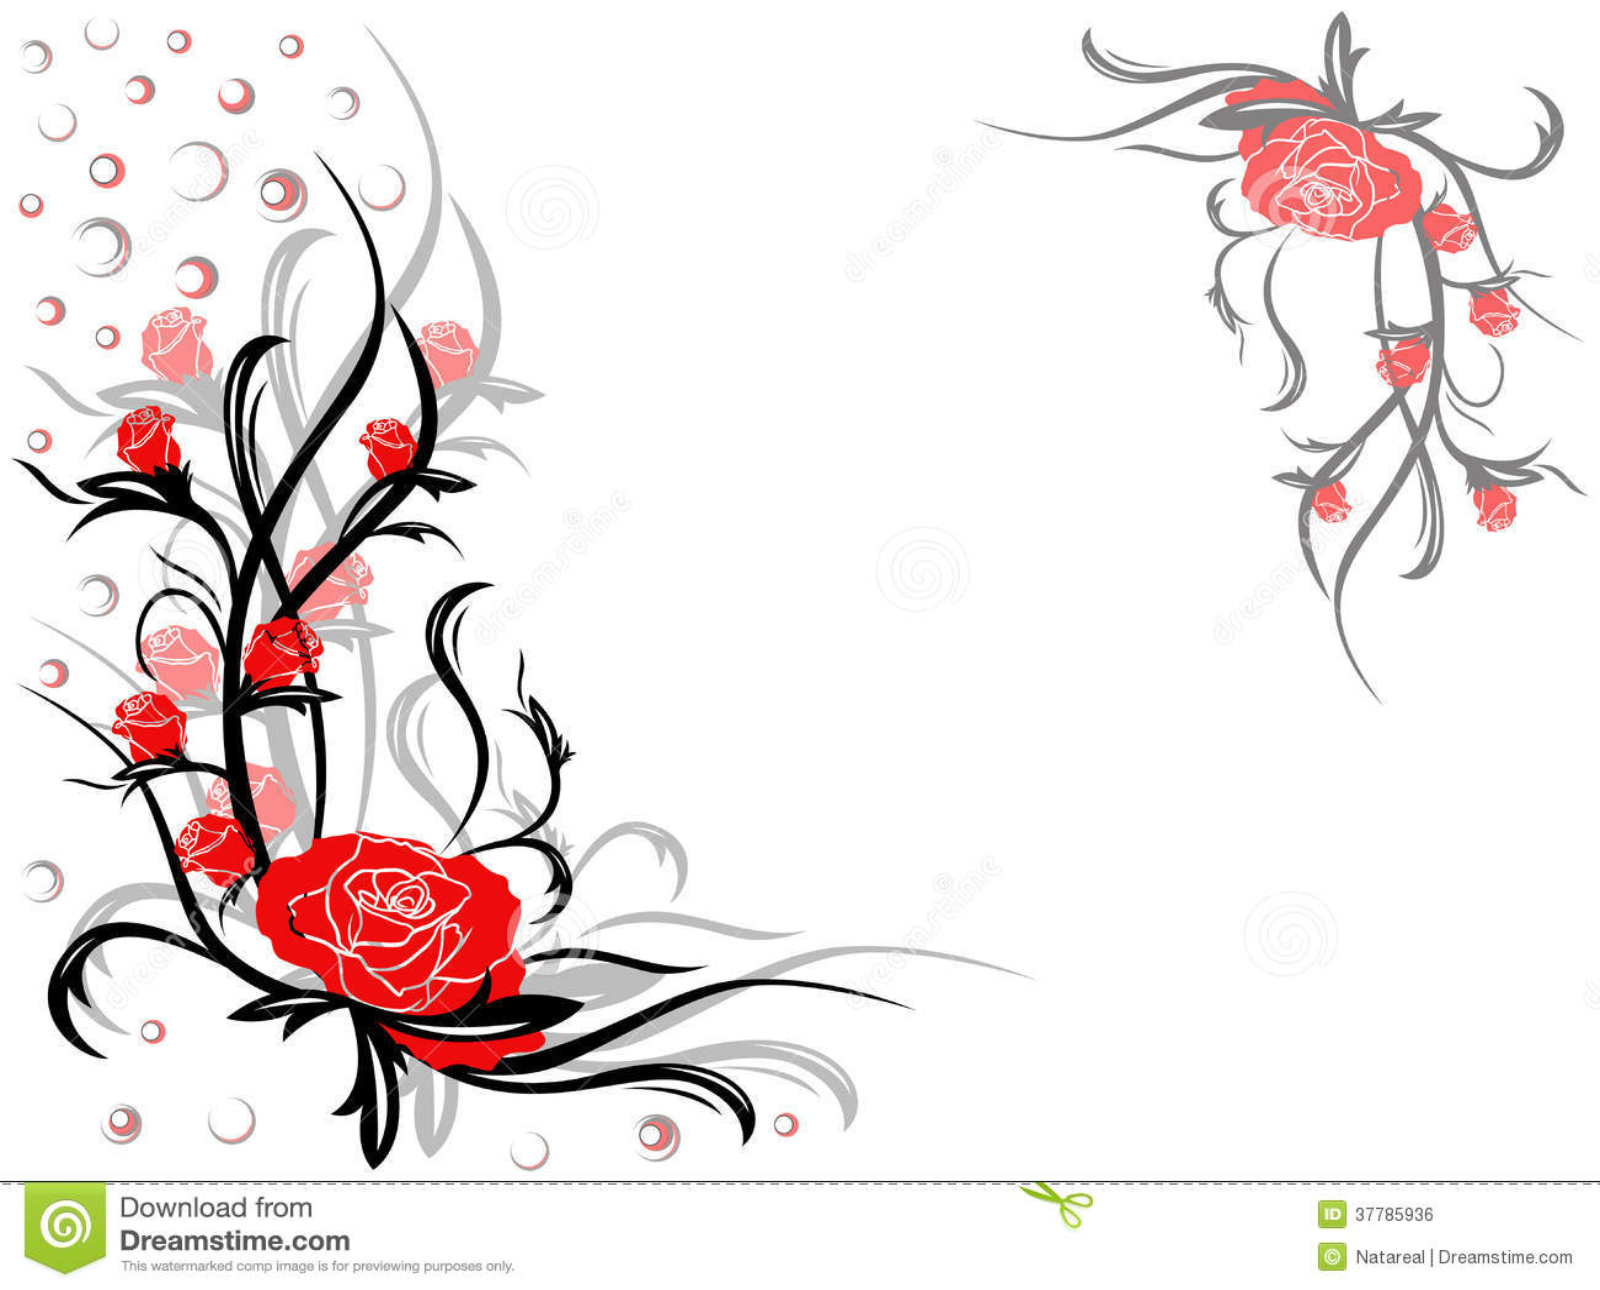 swirly roses background bouquet - photo #1